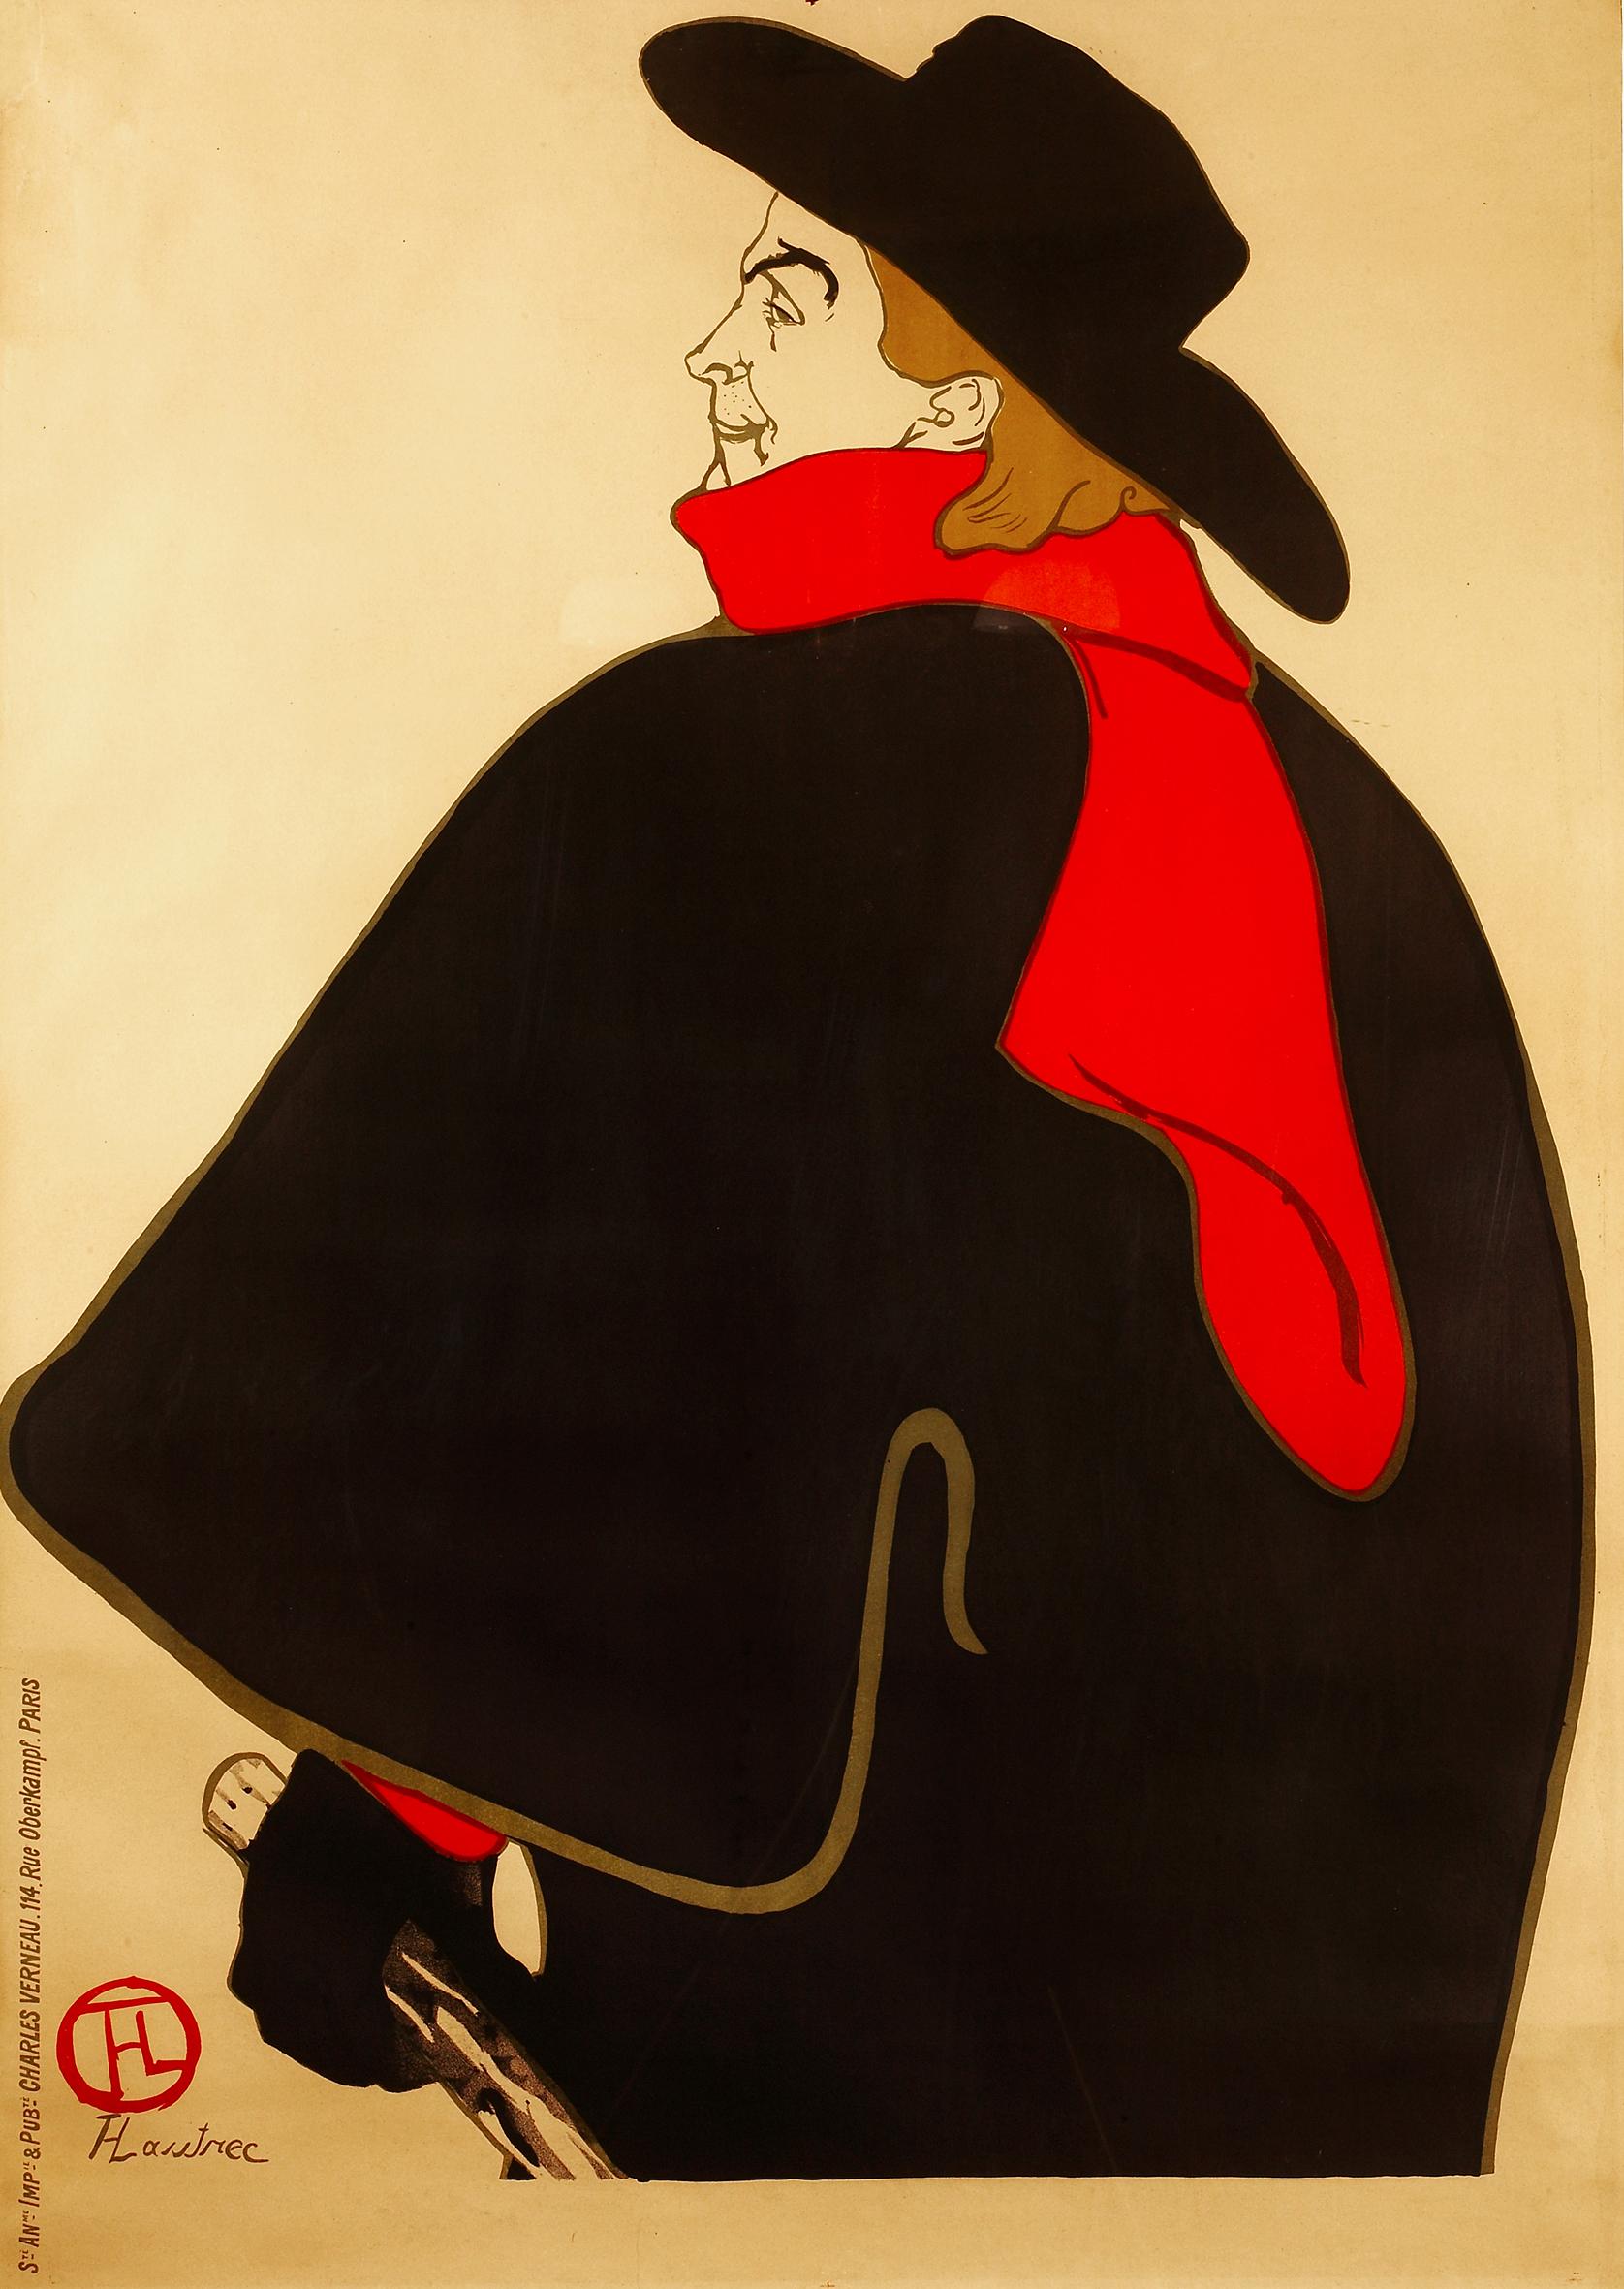 La Belle Époque di Toulouse-Lautrec in mostra a Torino